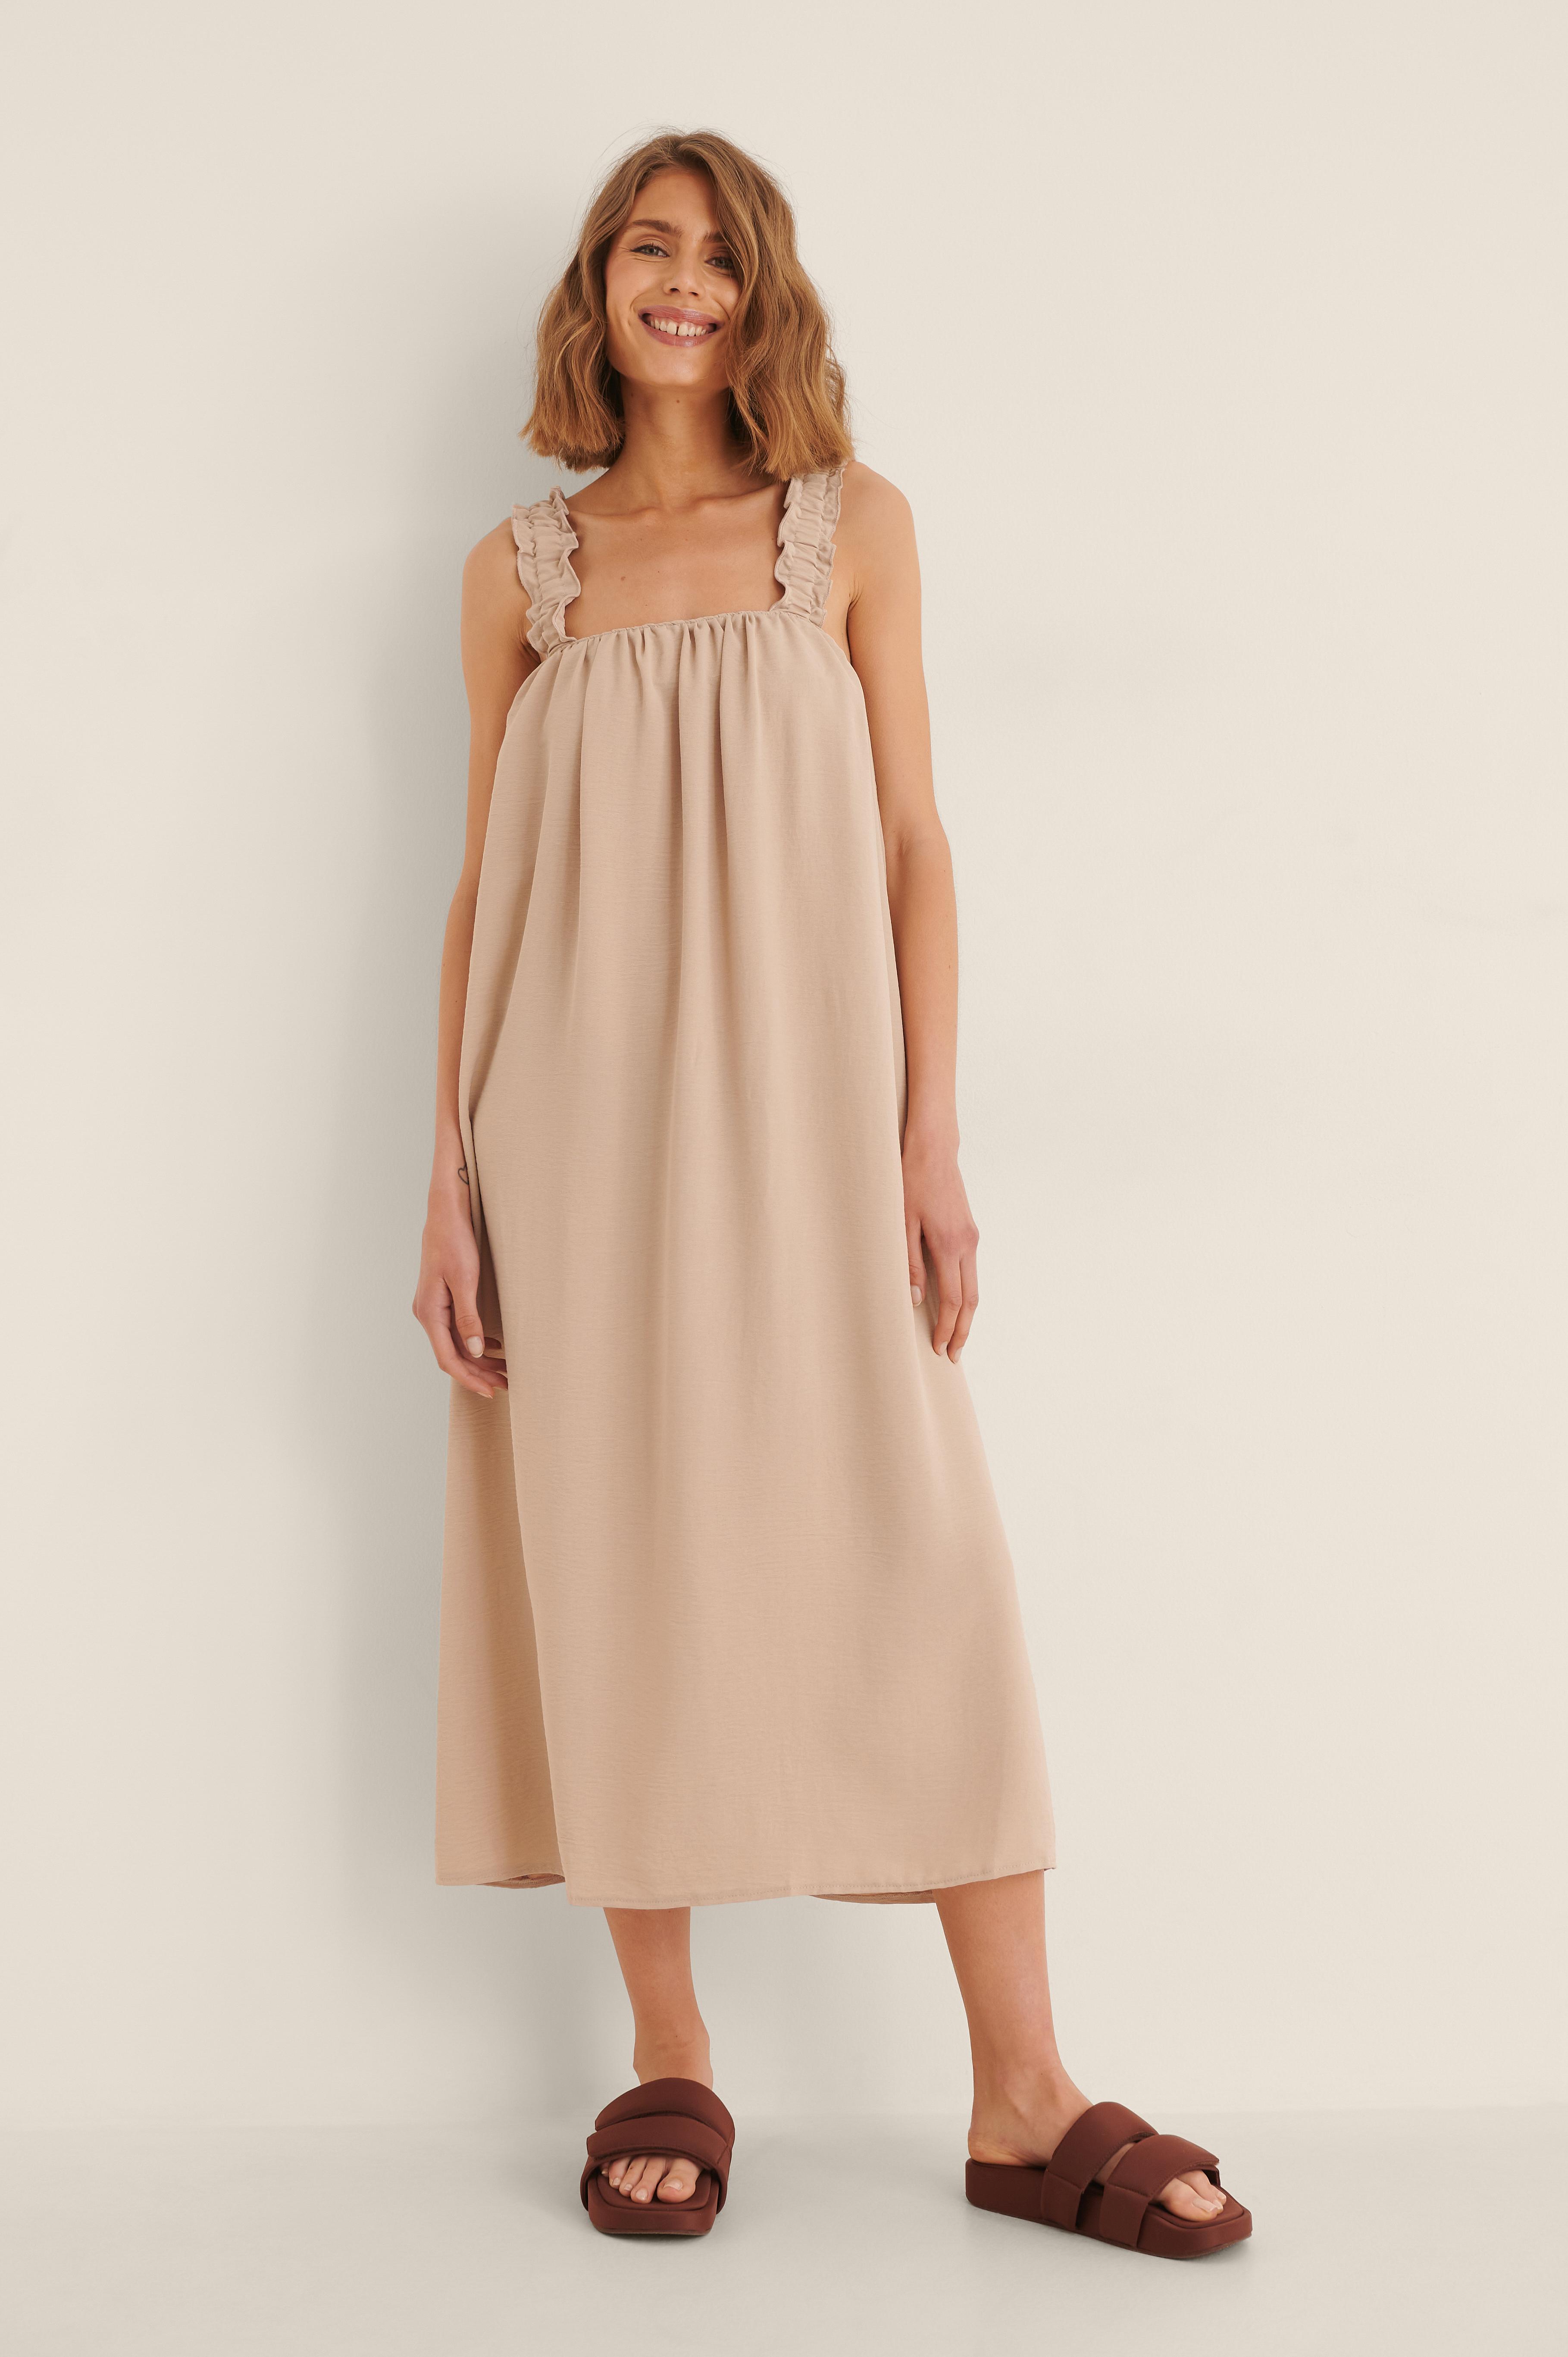 Trendyol Tie Detail Beach Dress - Beige